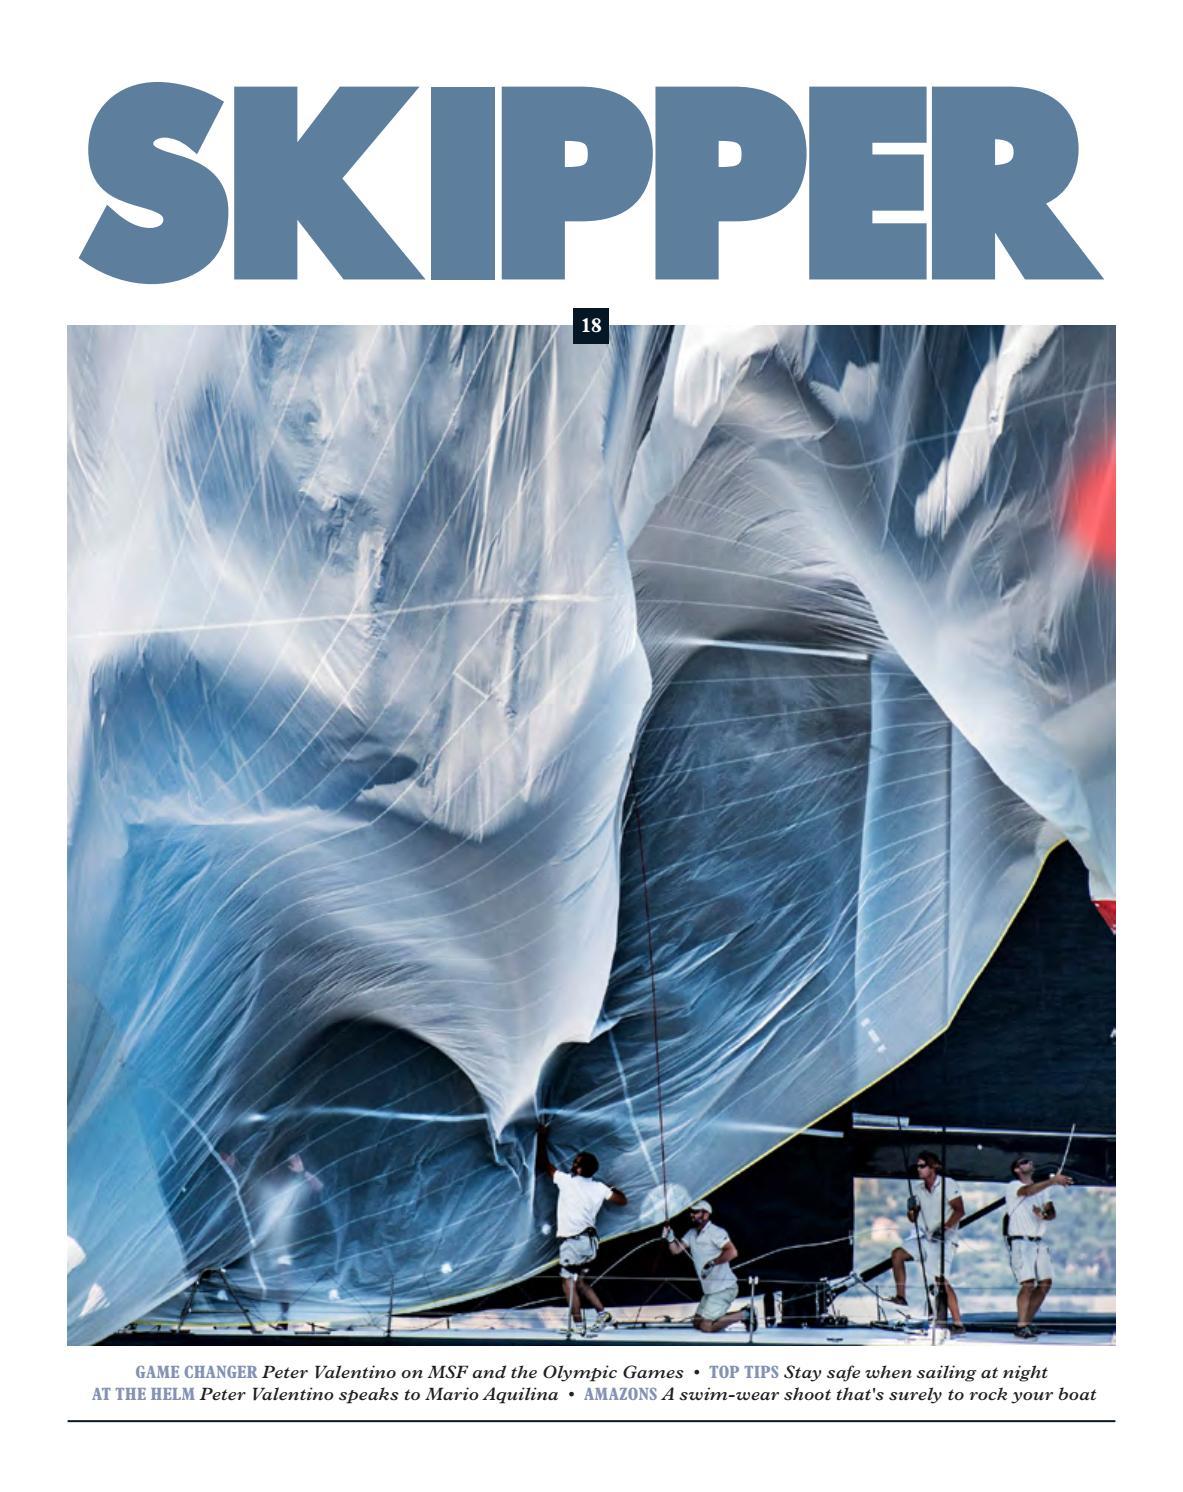 439fa7a5877cf SKIPPER AUG 2018 ISSUE 18 by Be Communications - issuu